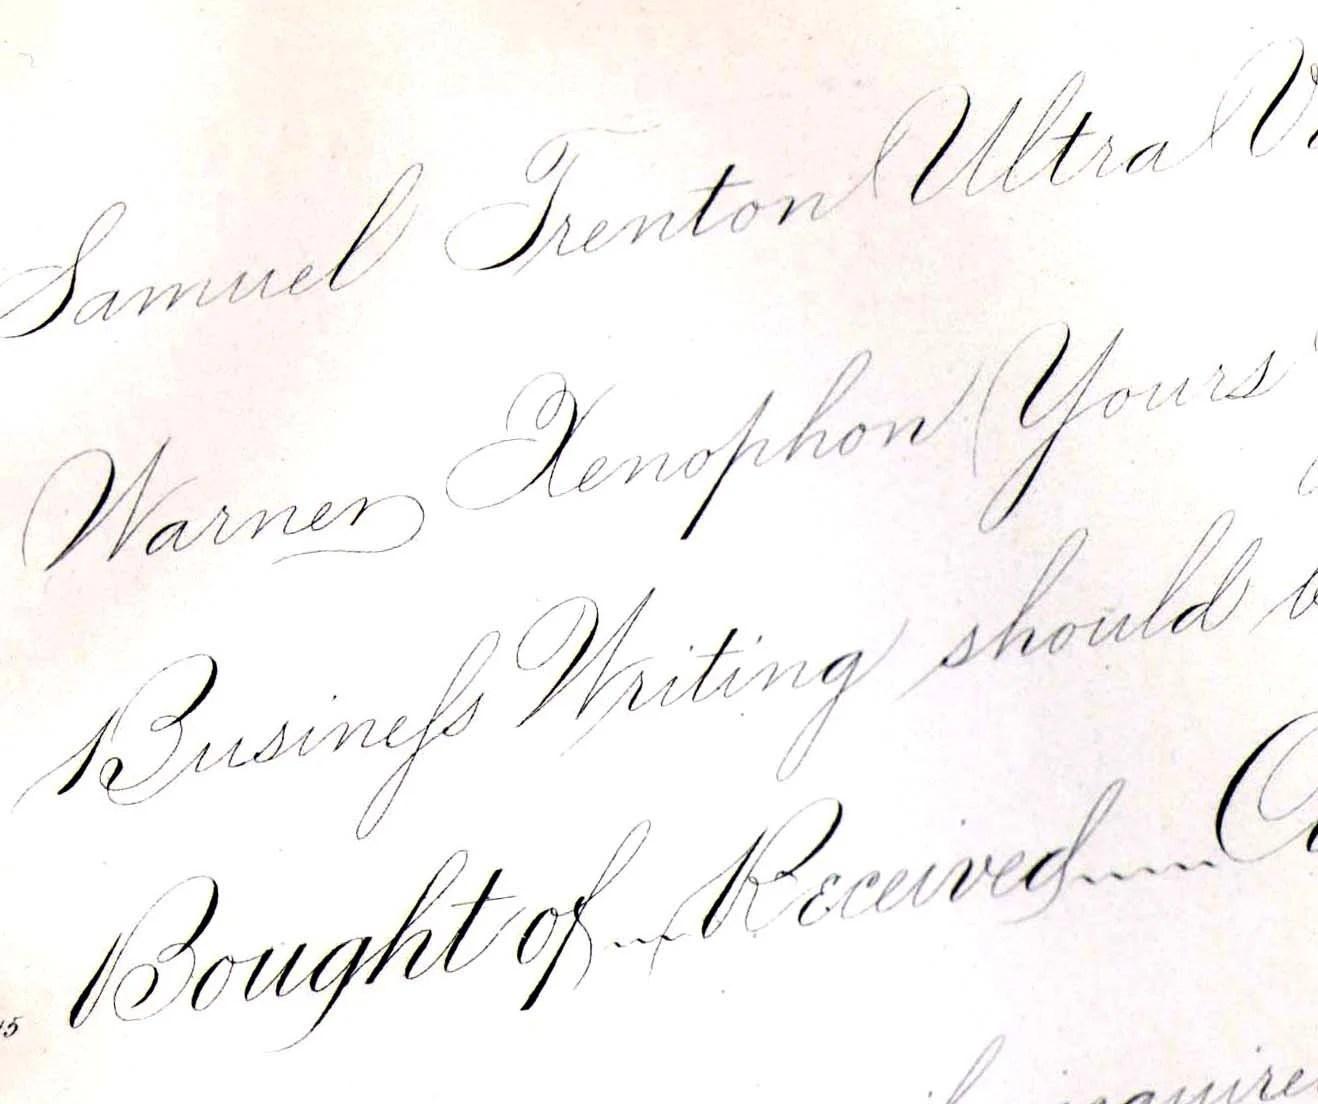 Palmer Method Ornamental Penmanship Victorian Calligraphy